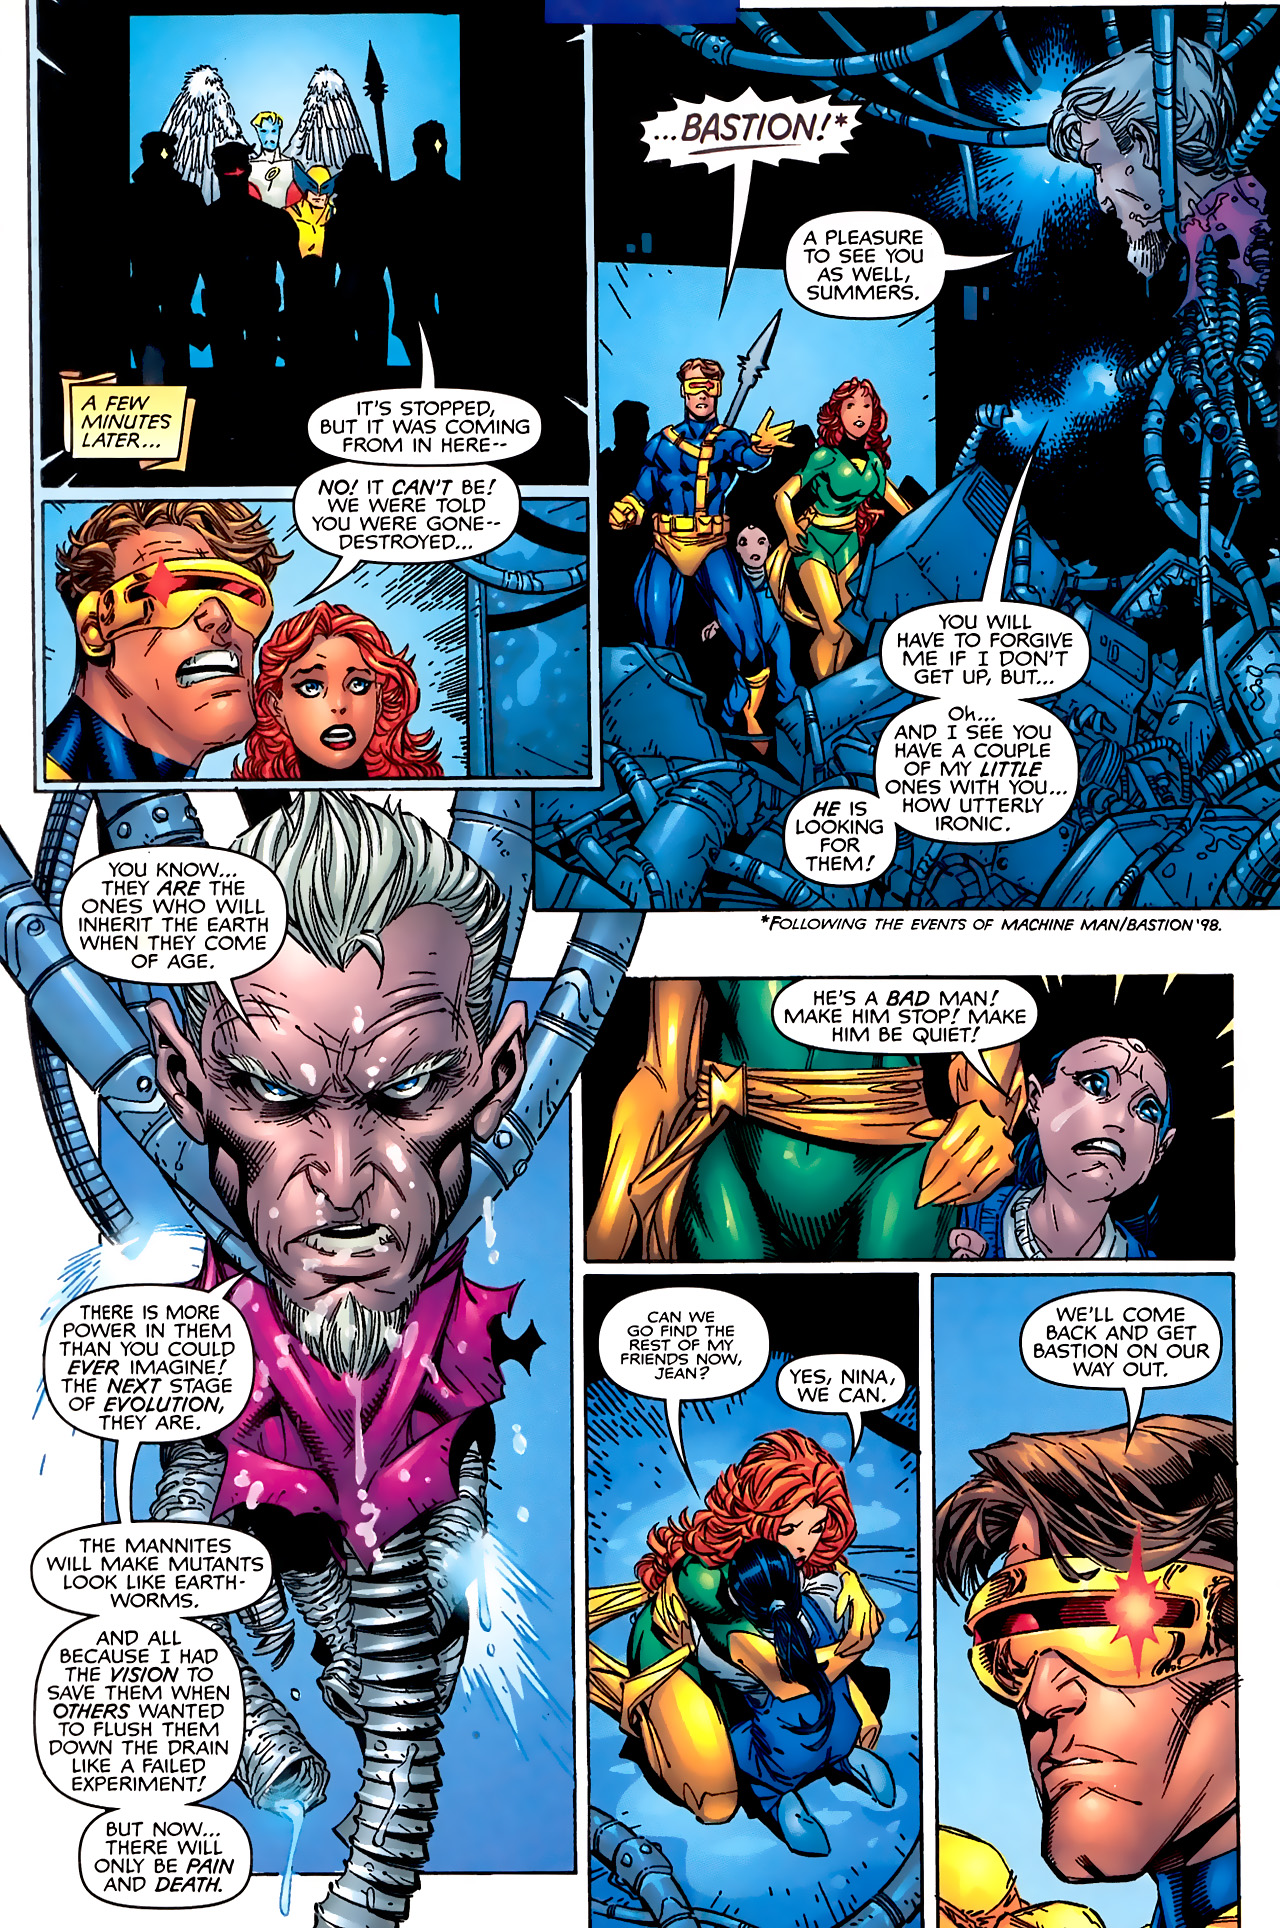 Read online Astonishing X-Men (1999) comic -  Issue #1 - 16